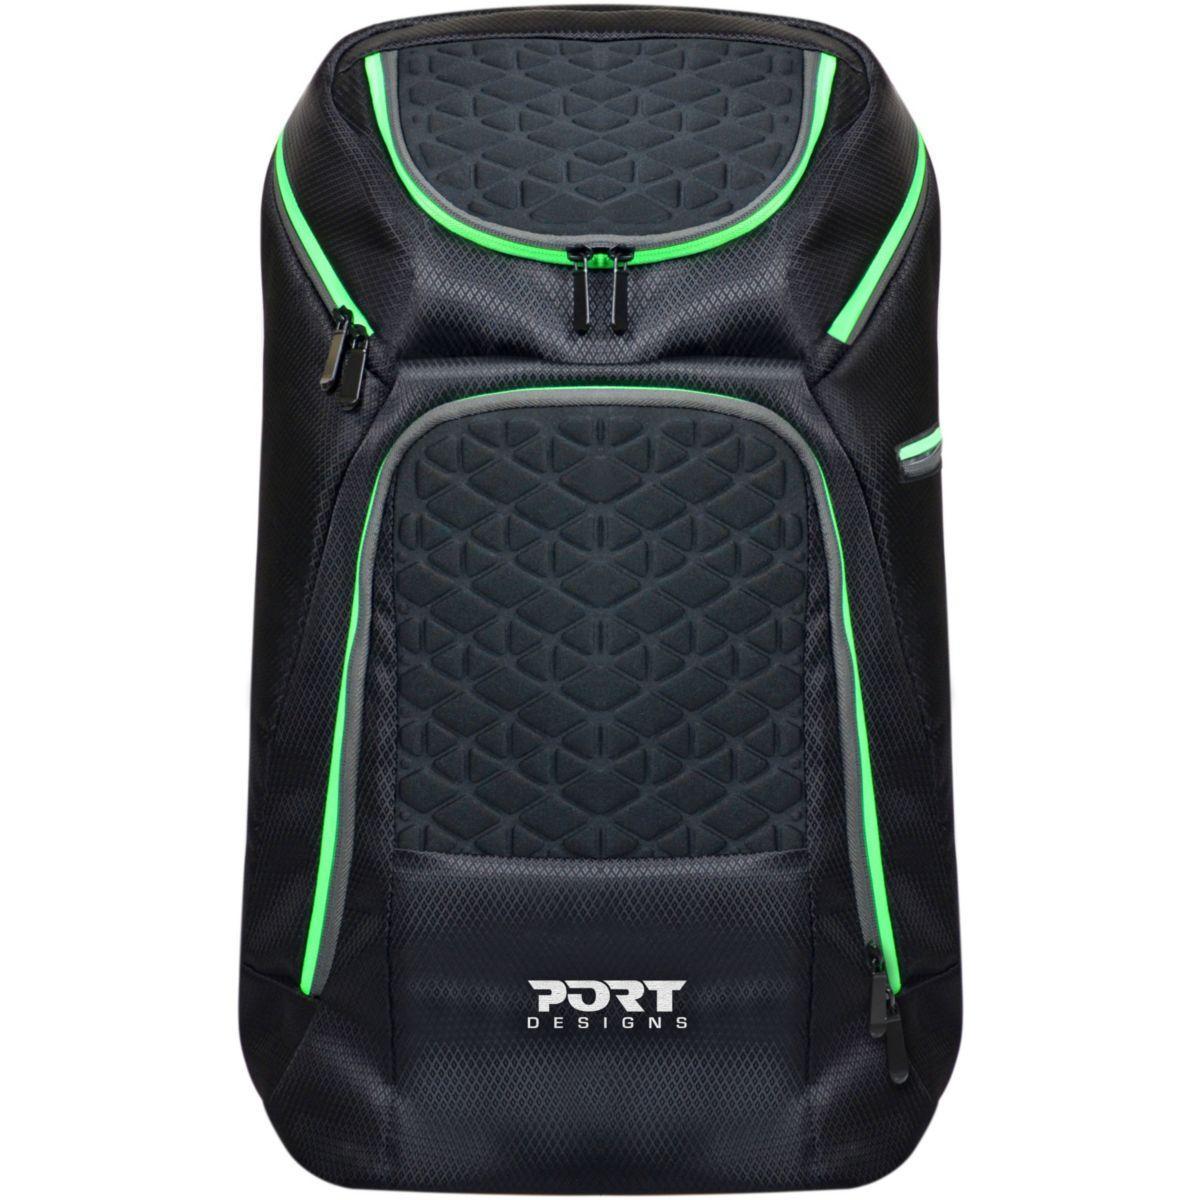 Sac � dos port gaming backpack 17' - livraison offerte : code premium